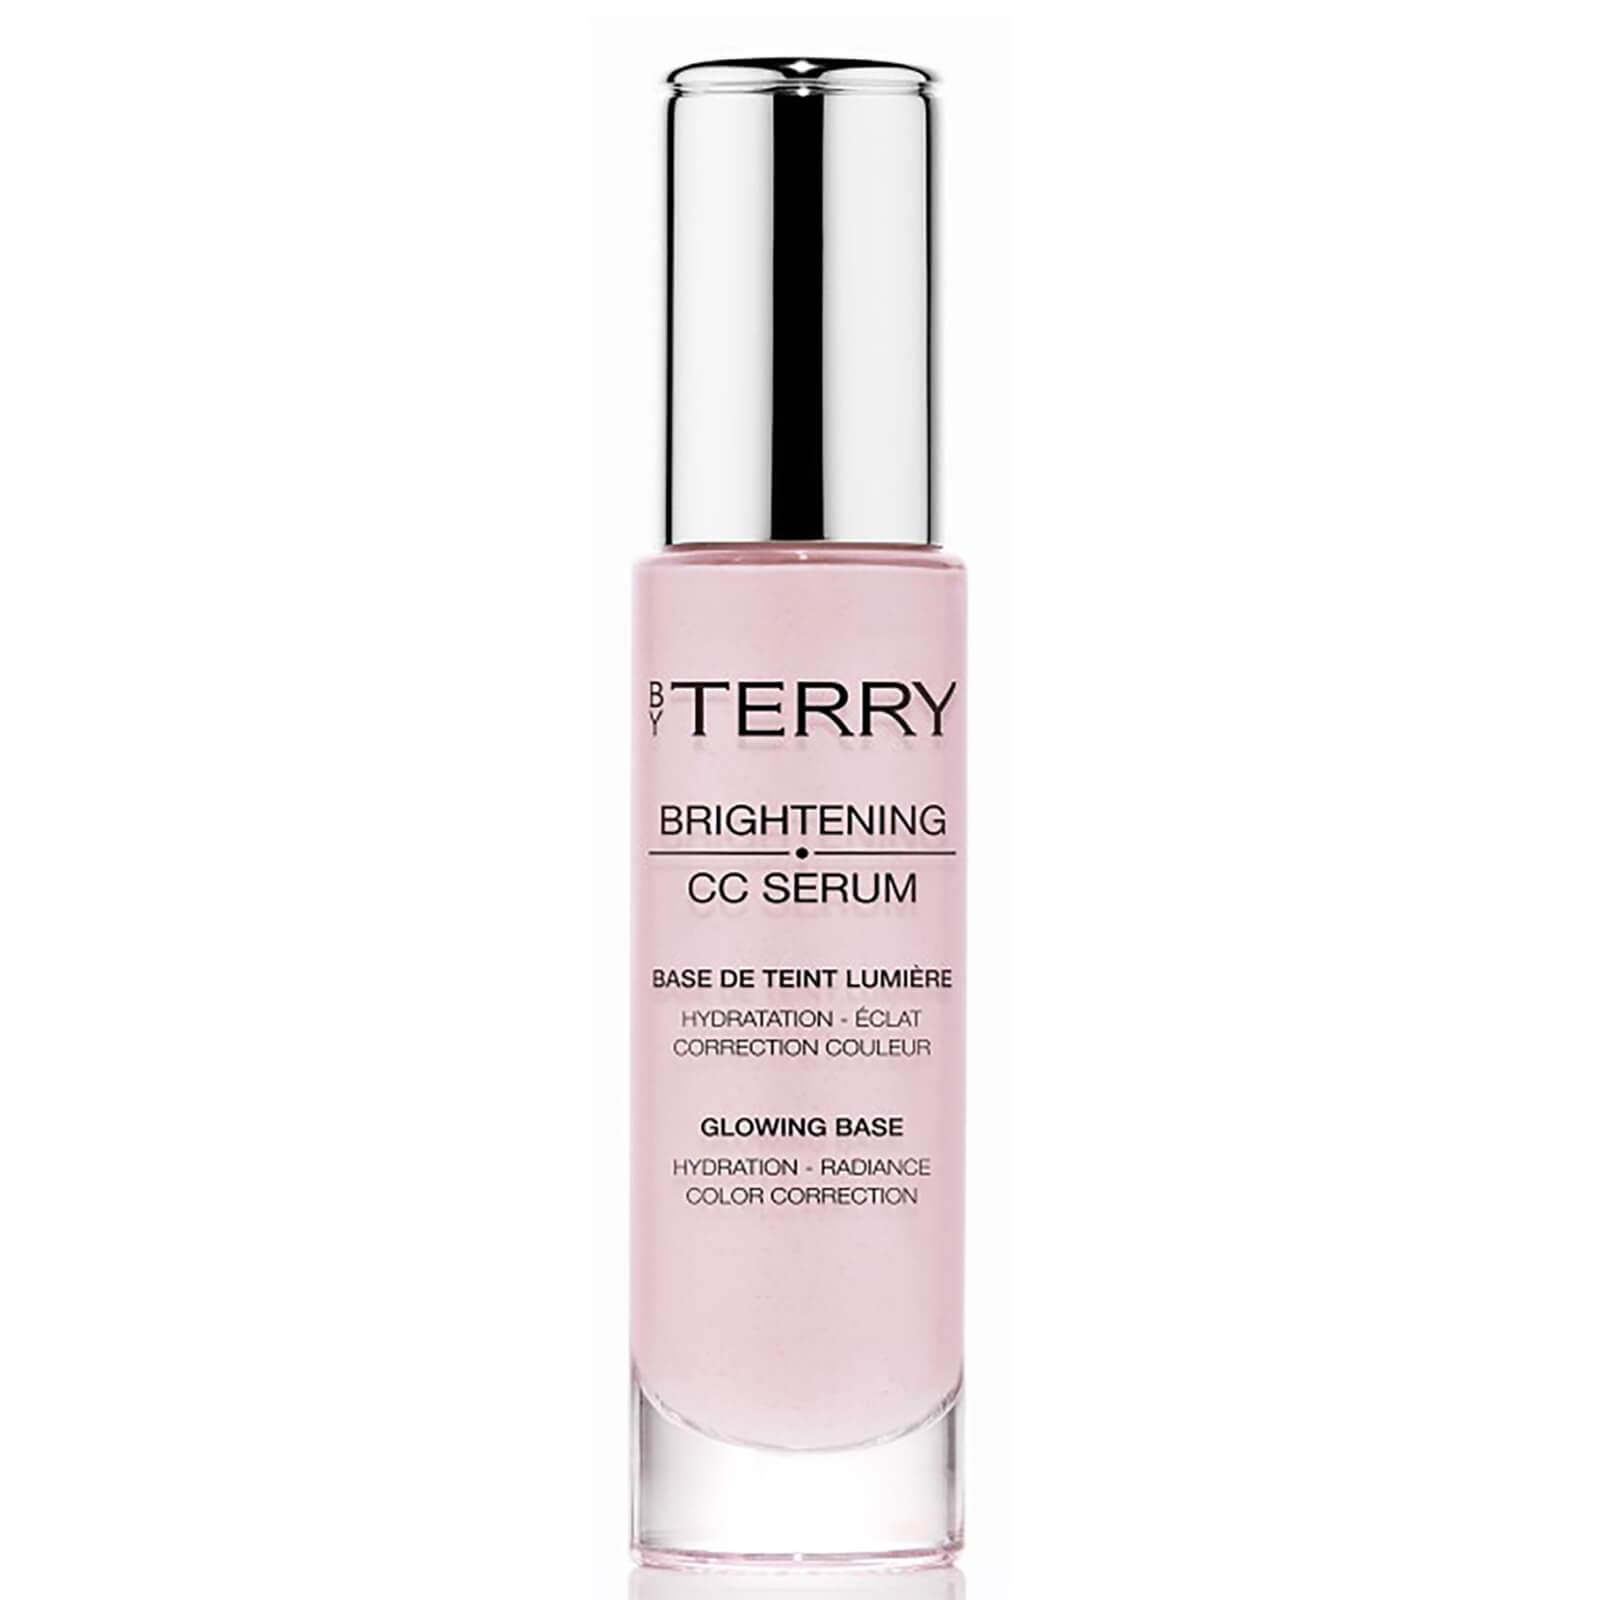 By Terry SIERO CC CELLULAROSE 30ML (VARIE TONALITÀ) - No.2 Rose Elixir